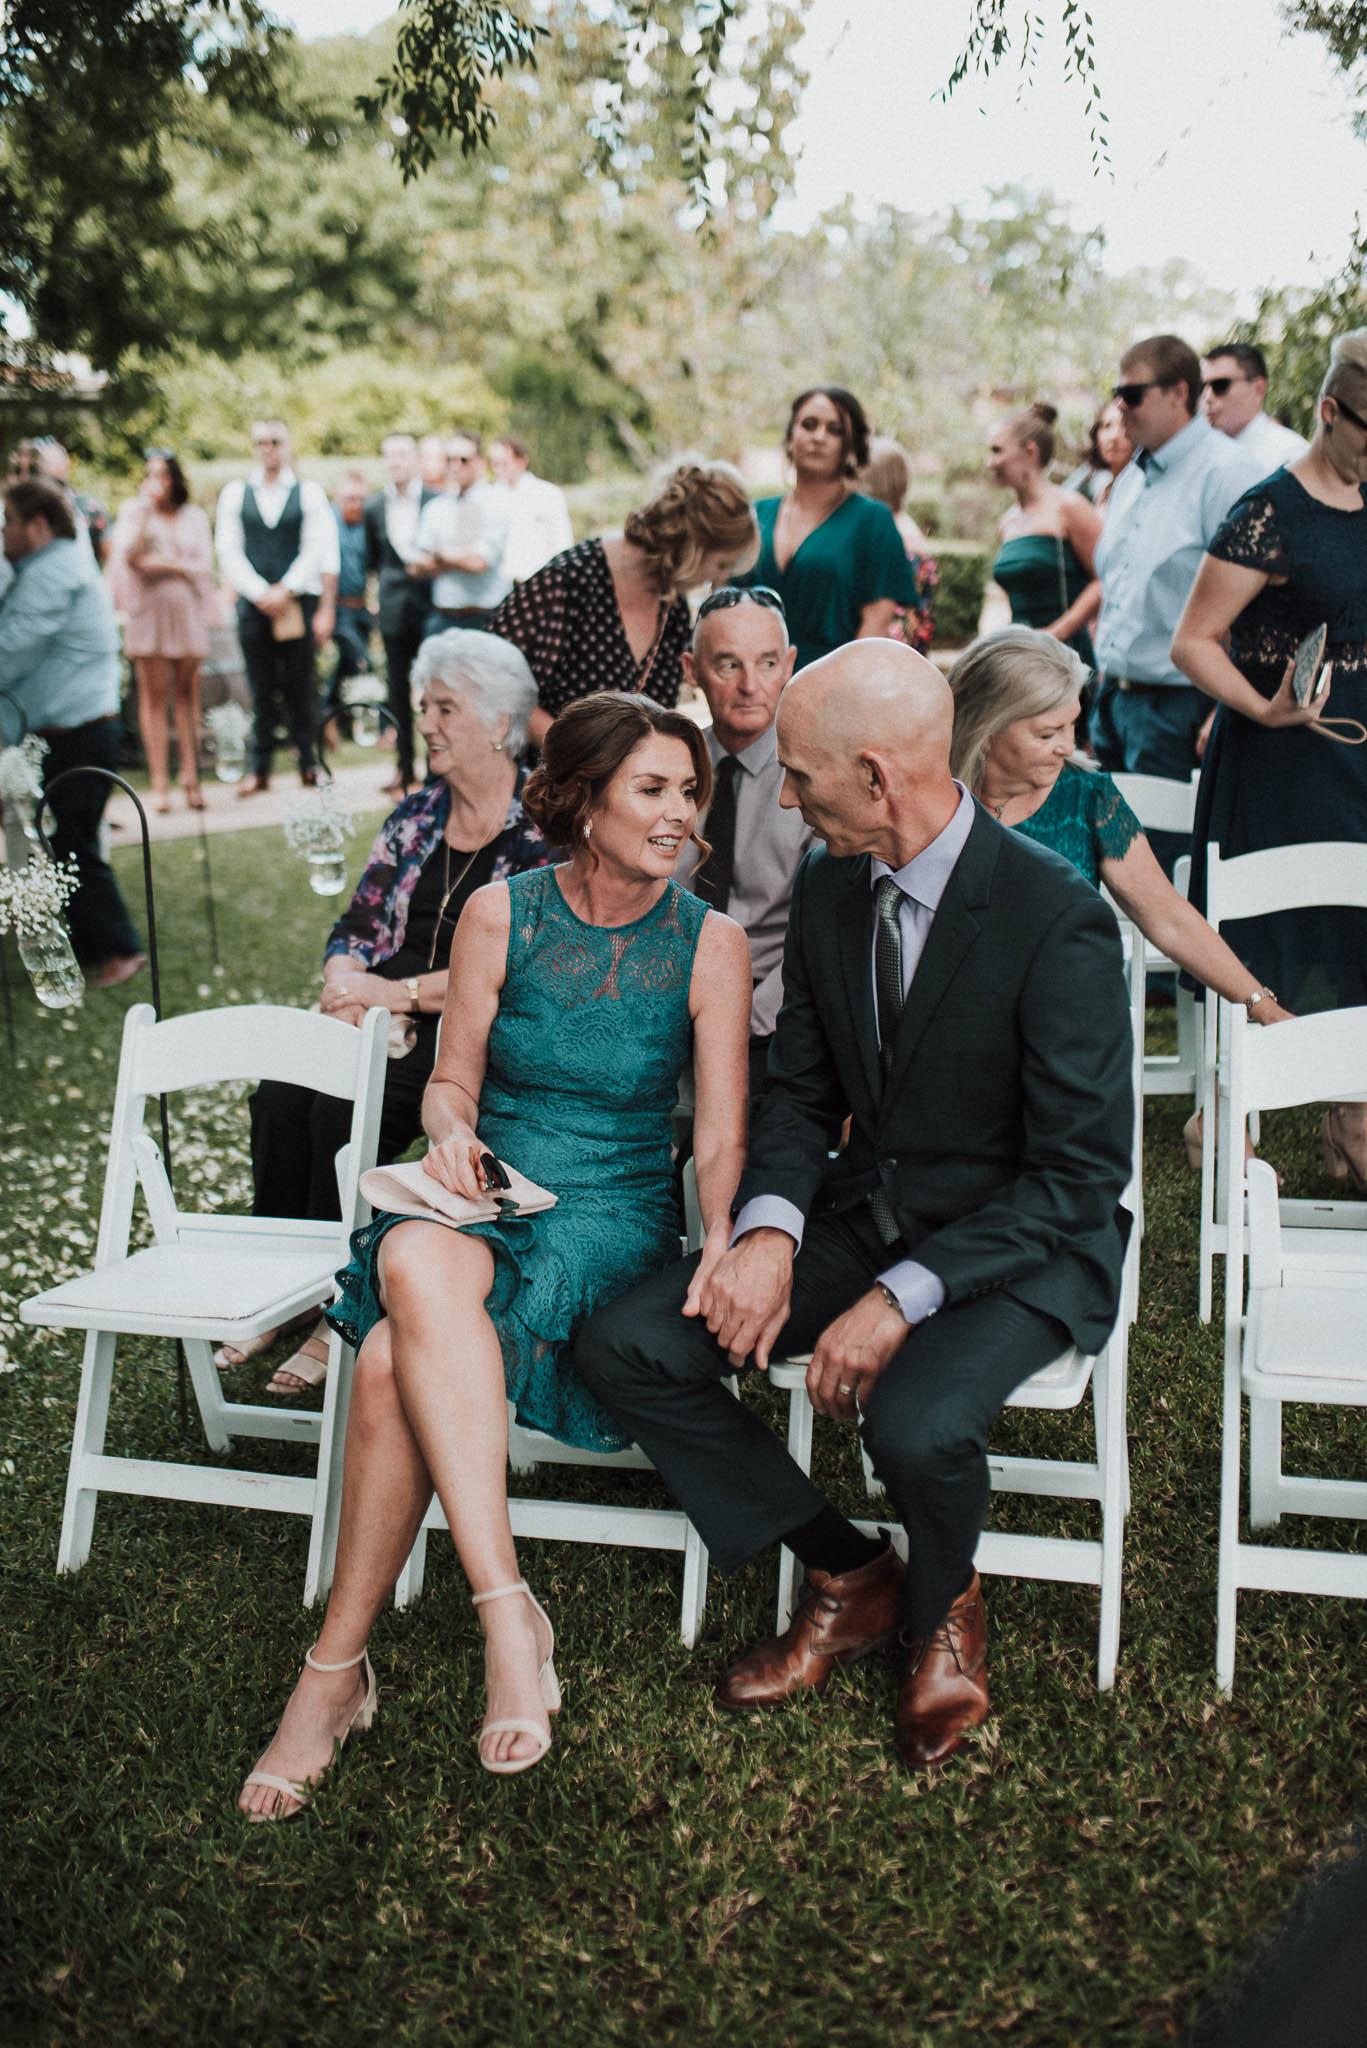 MECURE-RESORT-WEDDING-KING-WEB-17.jpg